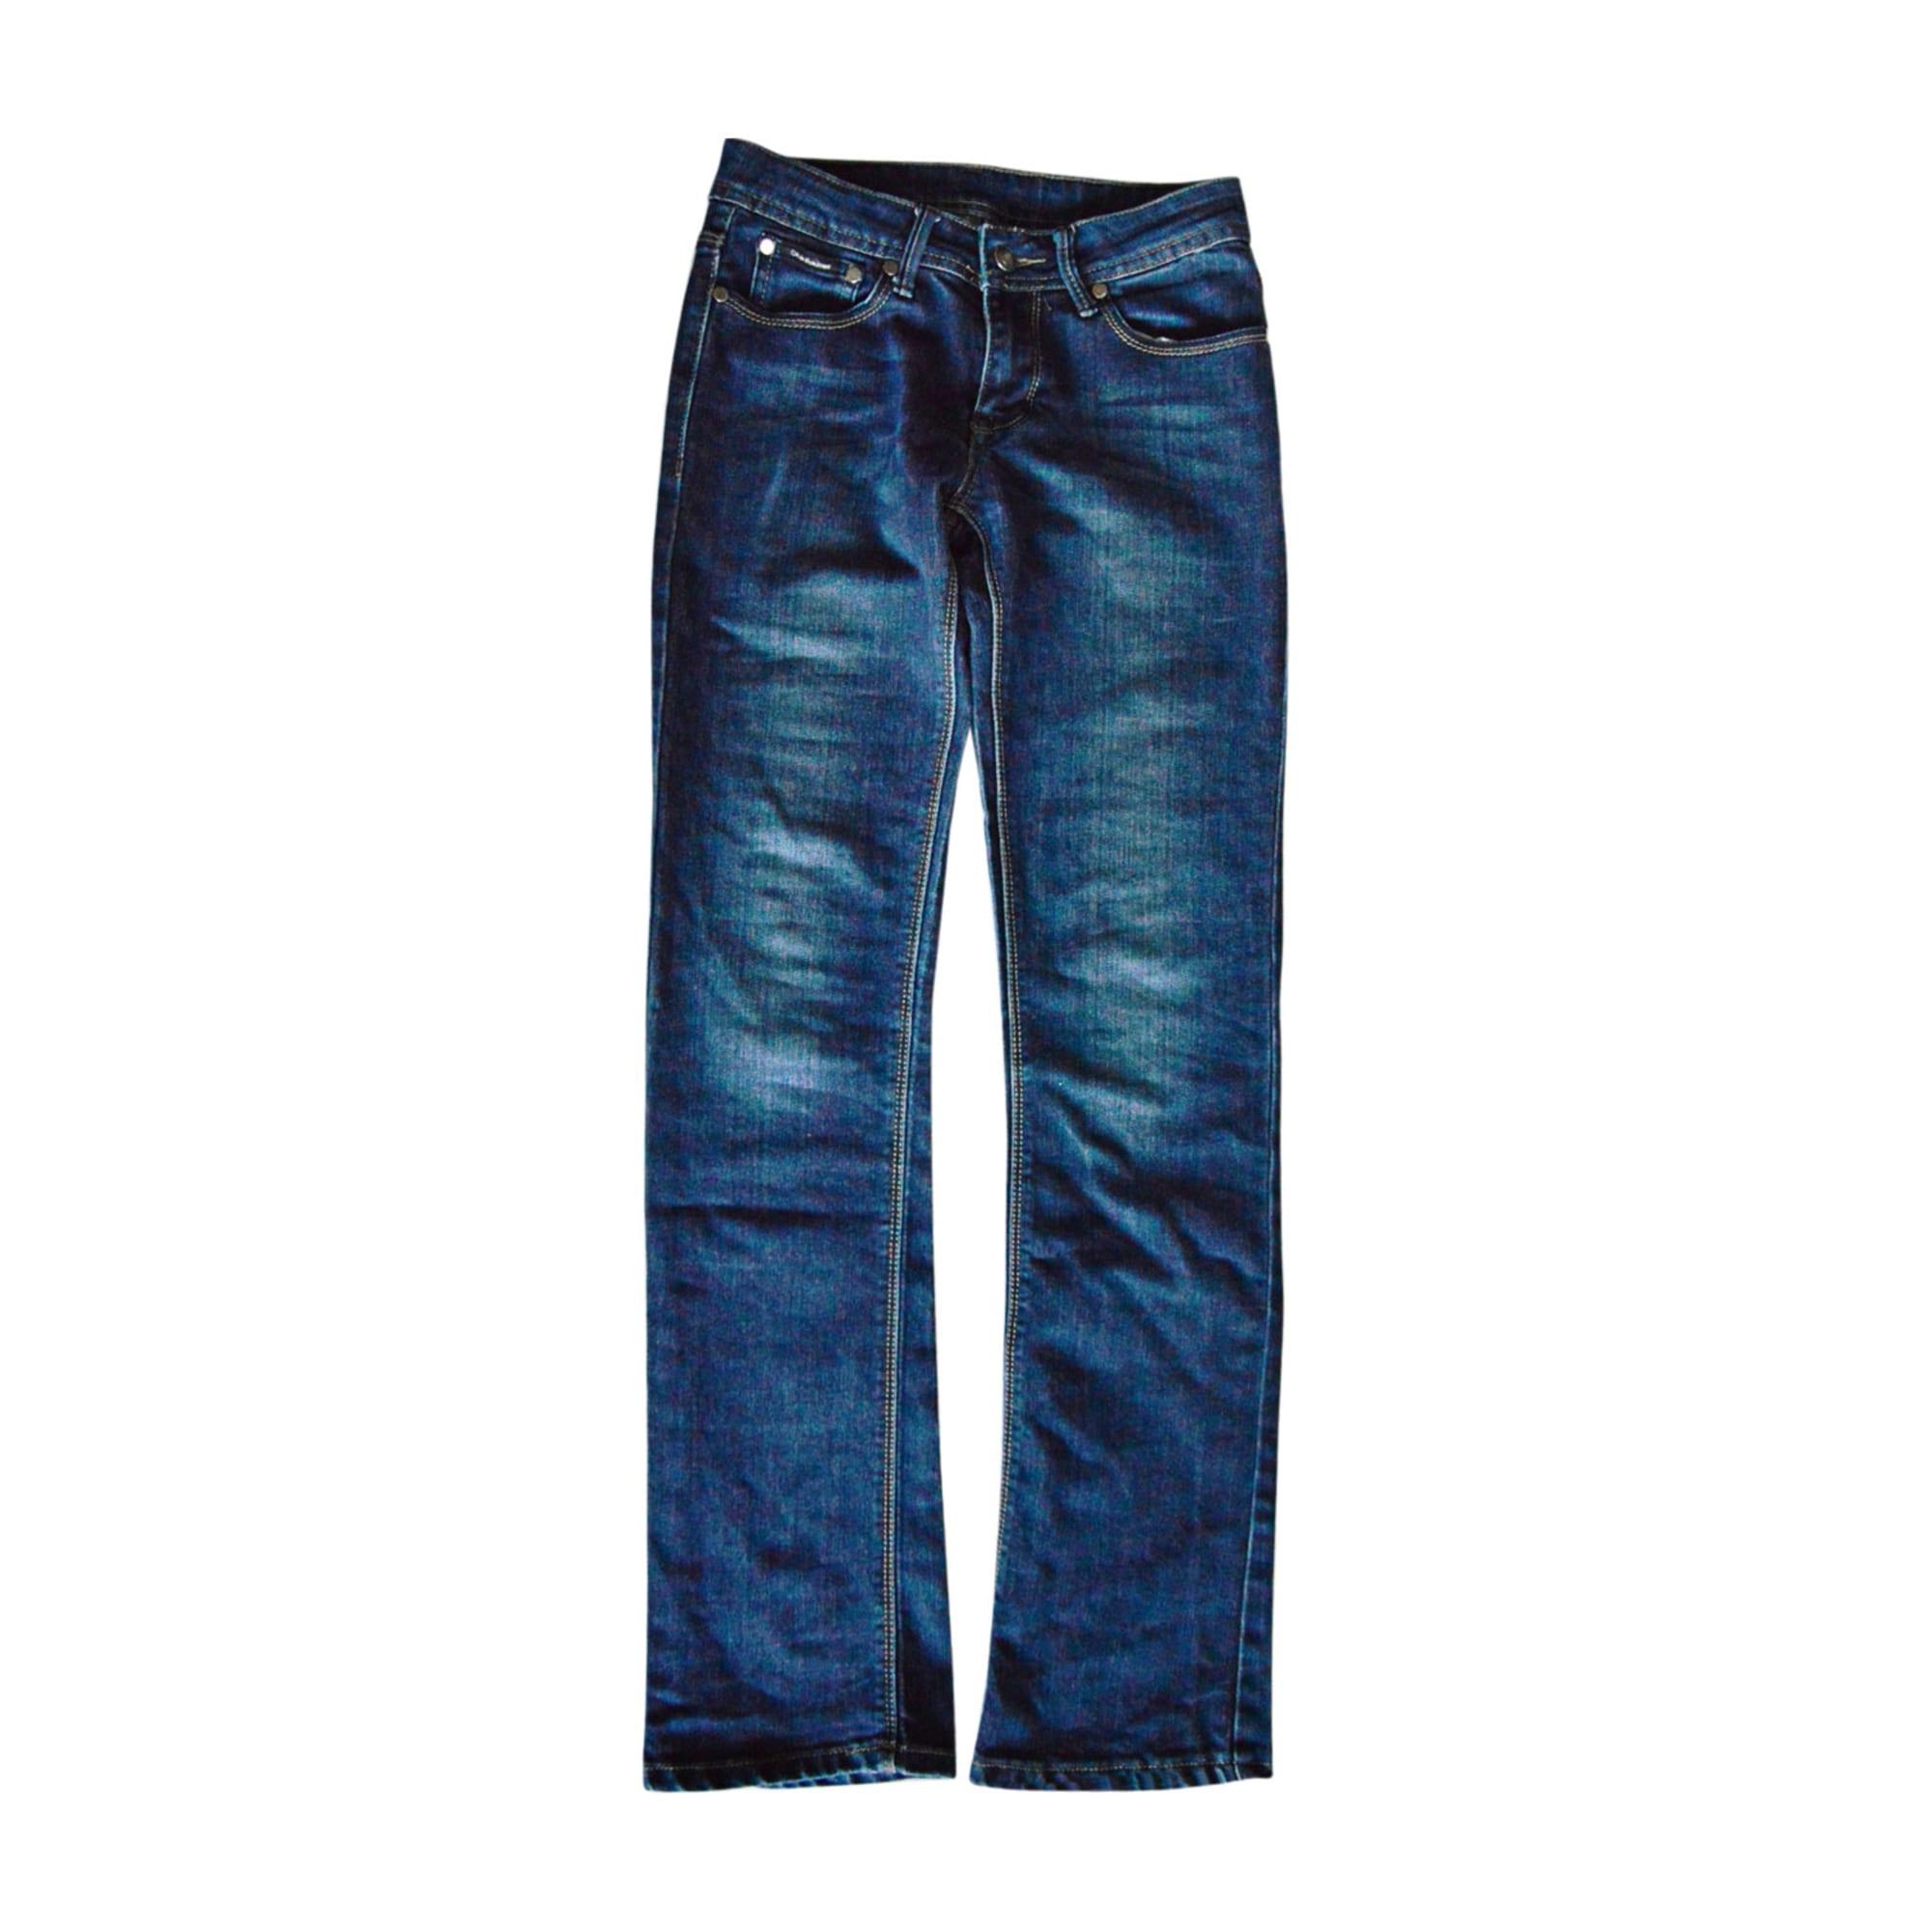 Jeans droit CALVIN KLEIN Bleu, bleu marine, bleu turquoise